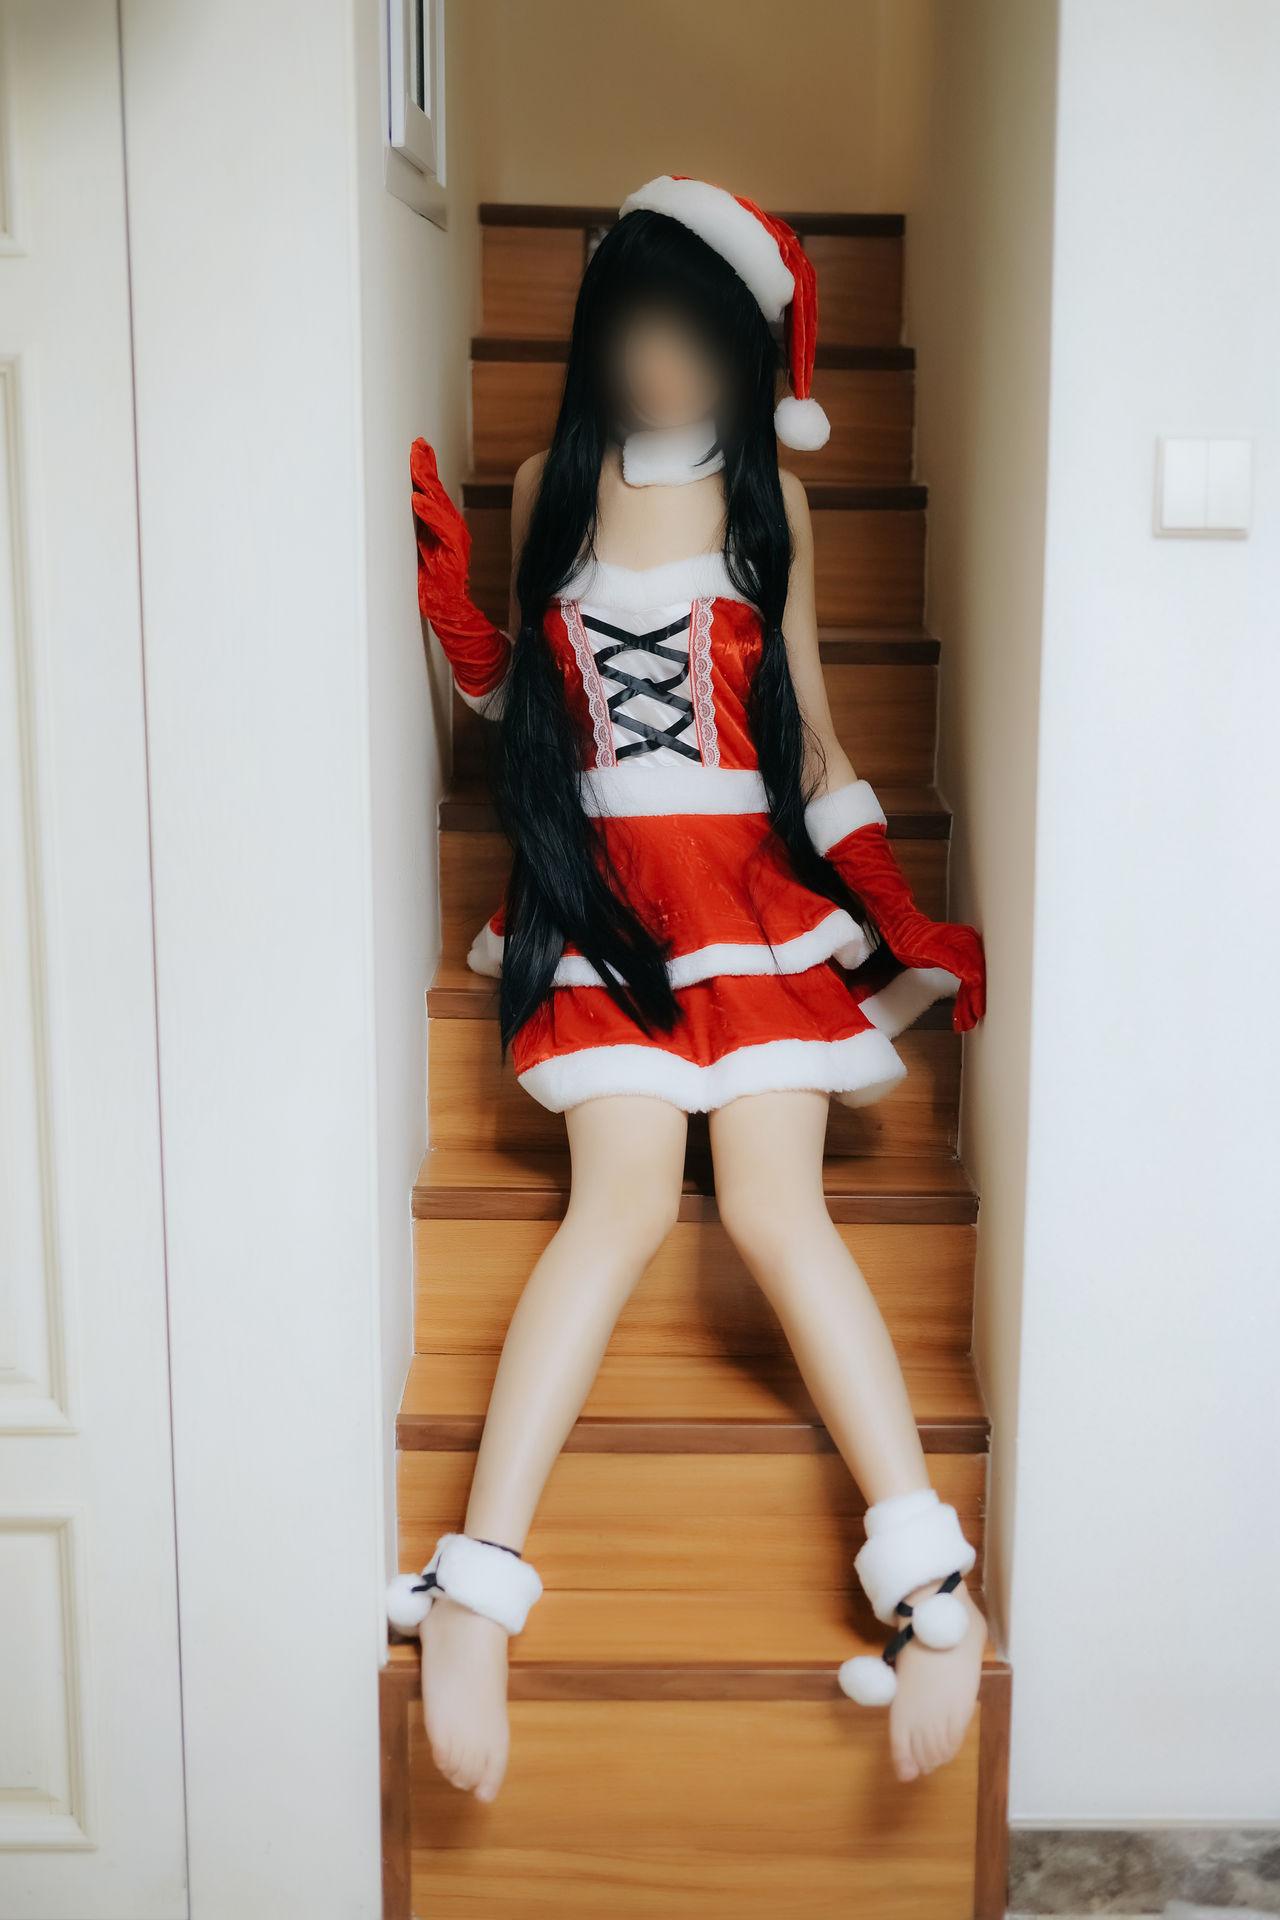 FZ40Xl - 【The Girl Theater】 少女映画 Cosplay Kurumi Tokisaki (Christmas Dress) 105P 預覽 Preview